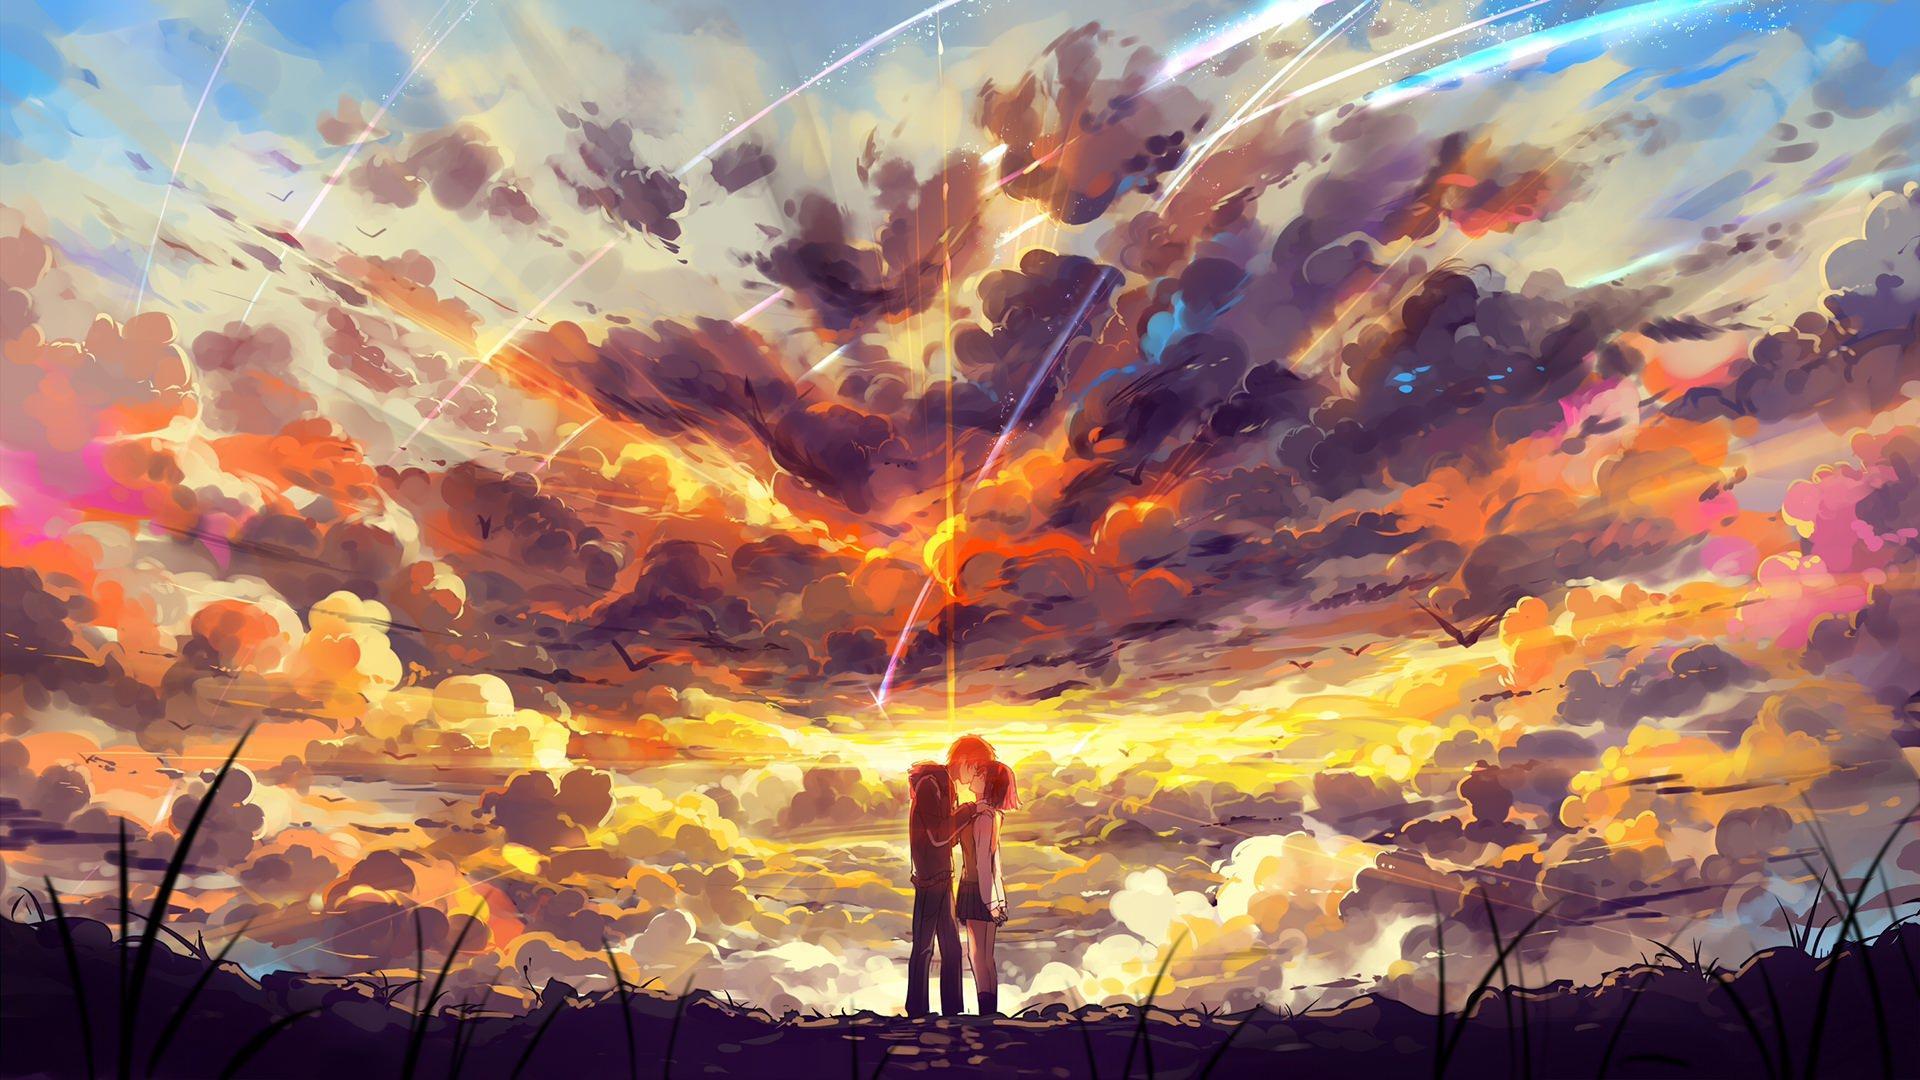 Your Name Anime Wallpapers Top Free Your Name Anime